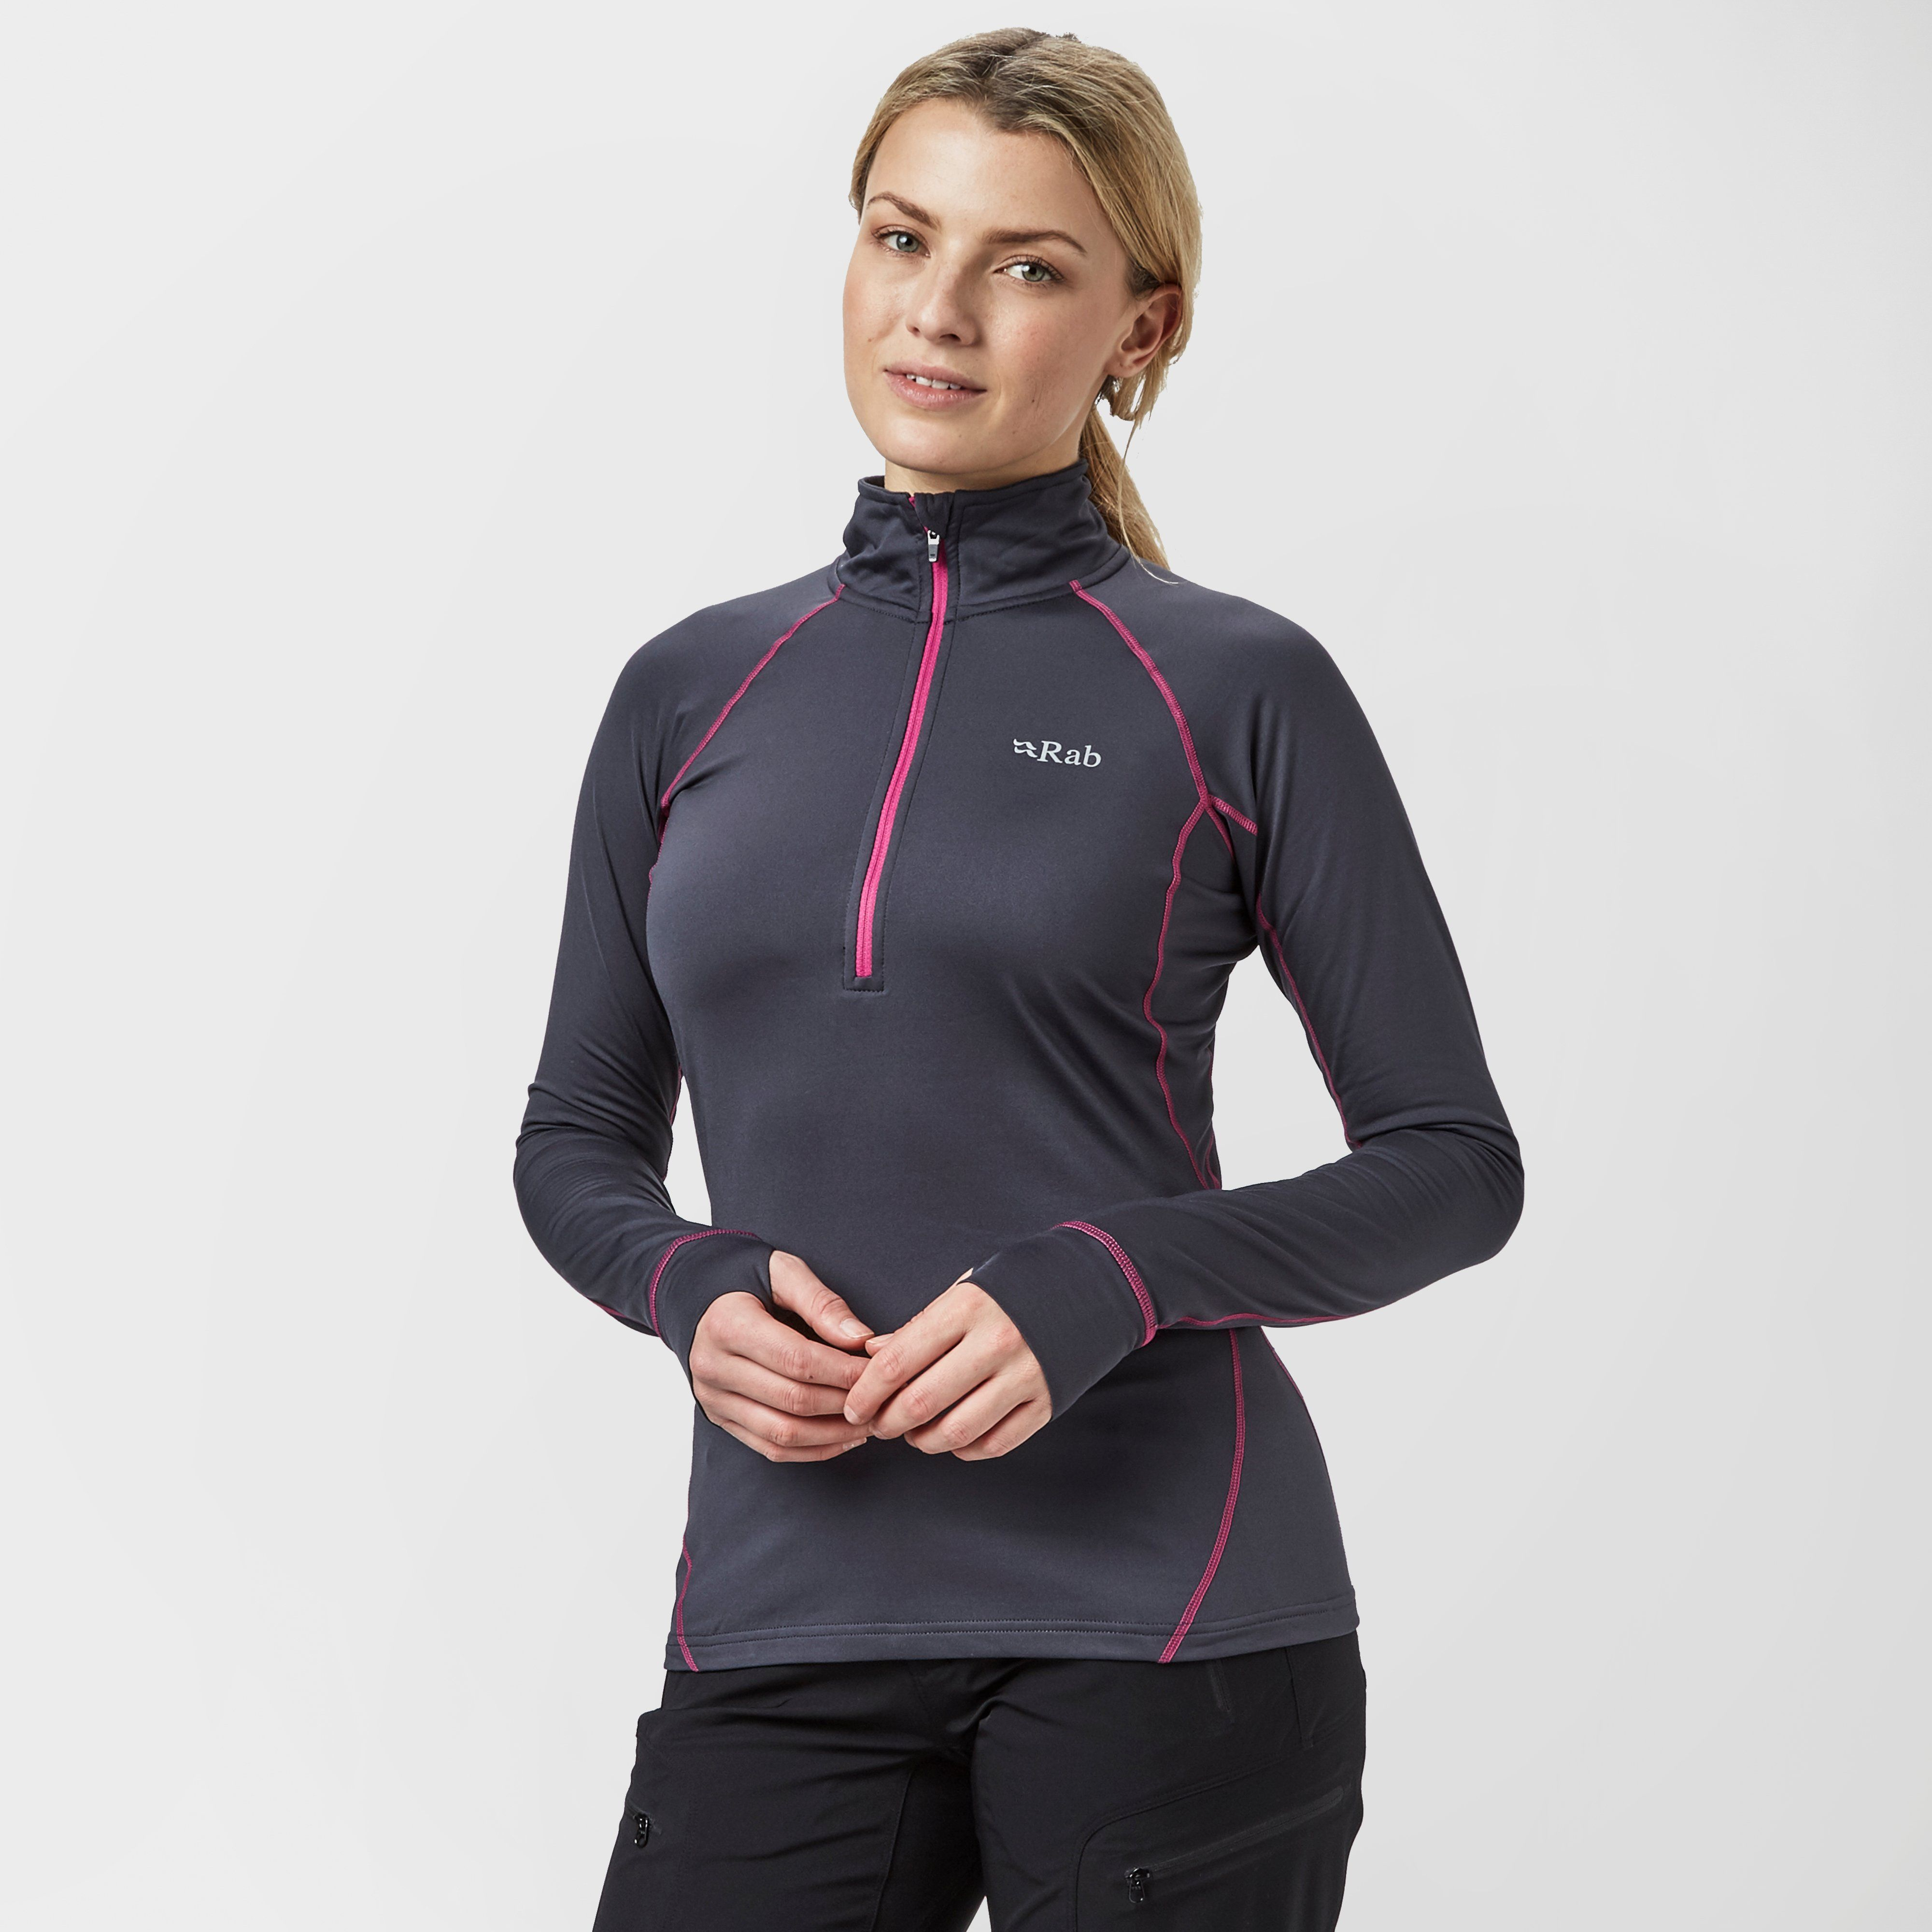 RAB Women's Flux Pull-On Half Zip Baselayer